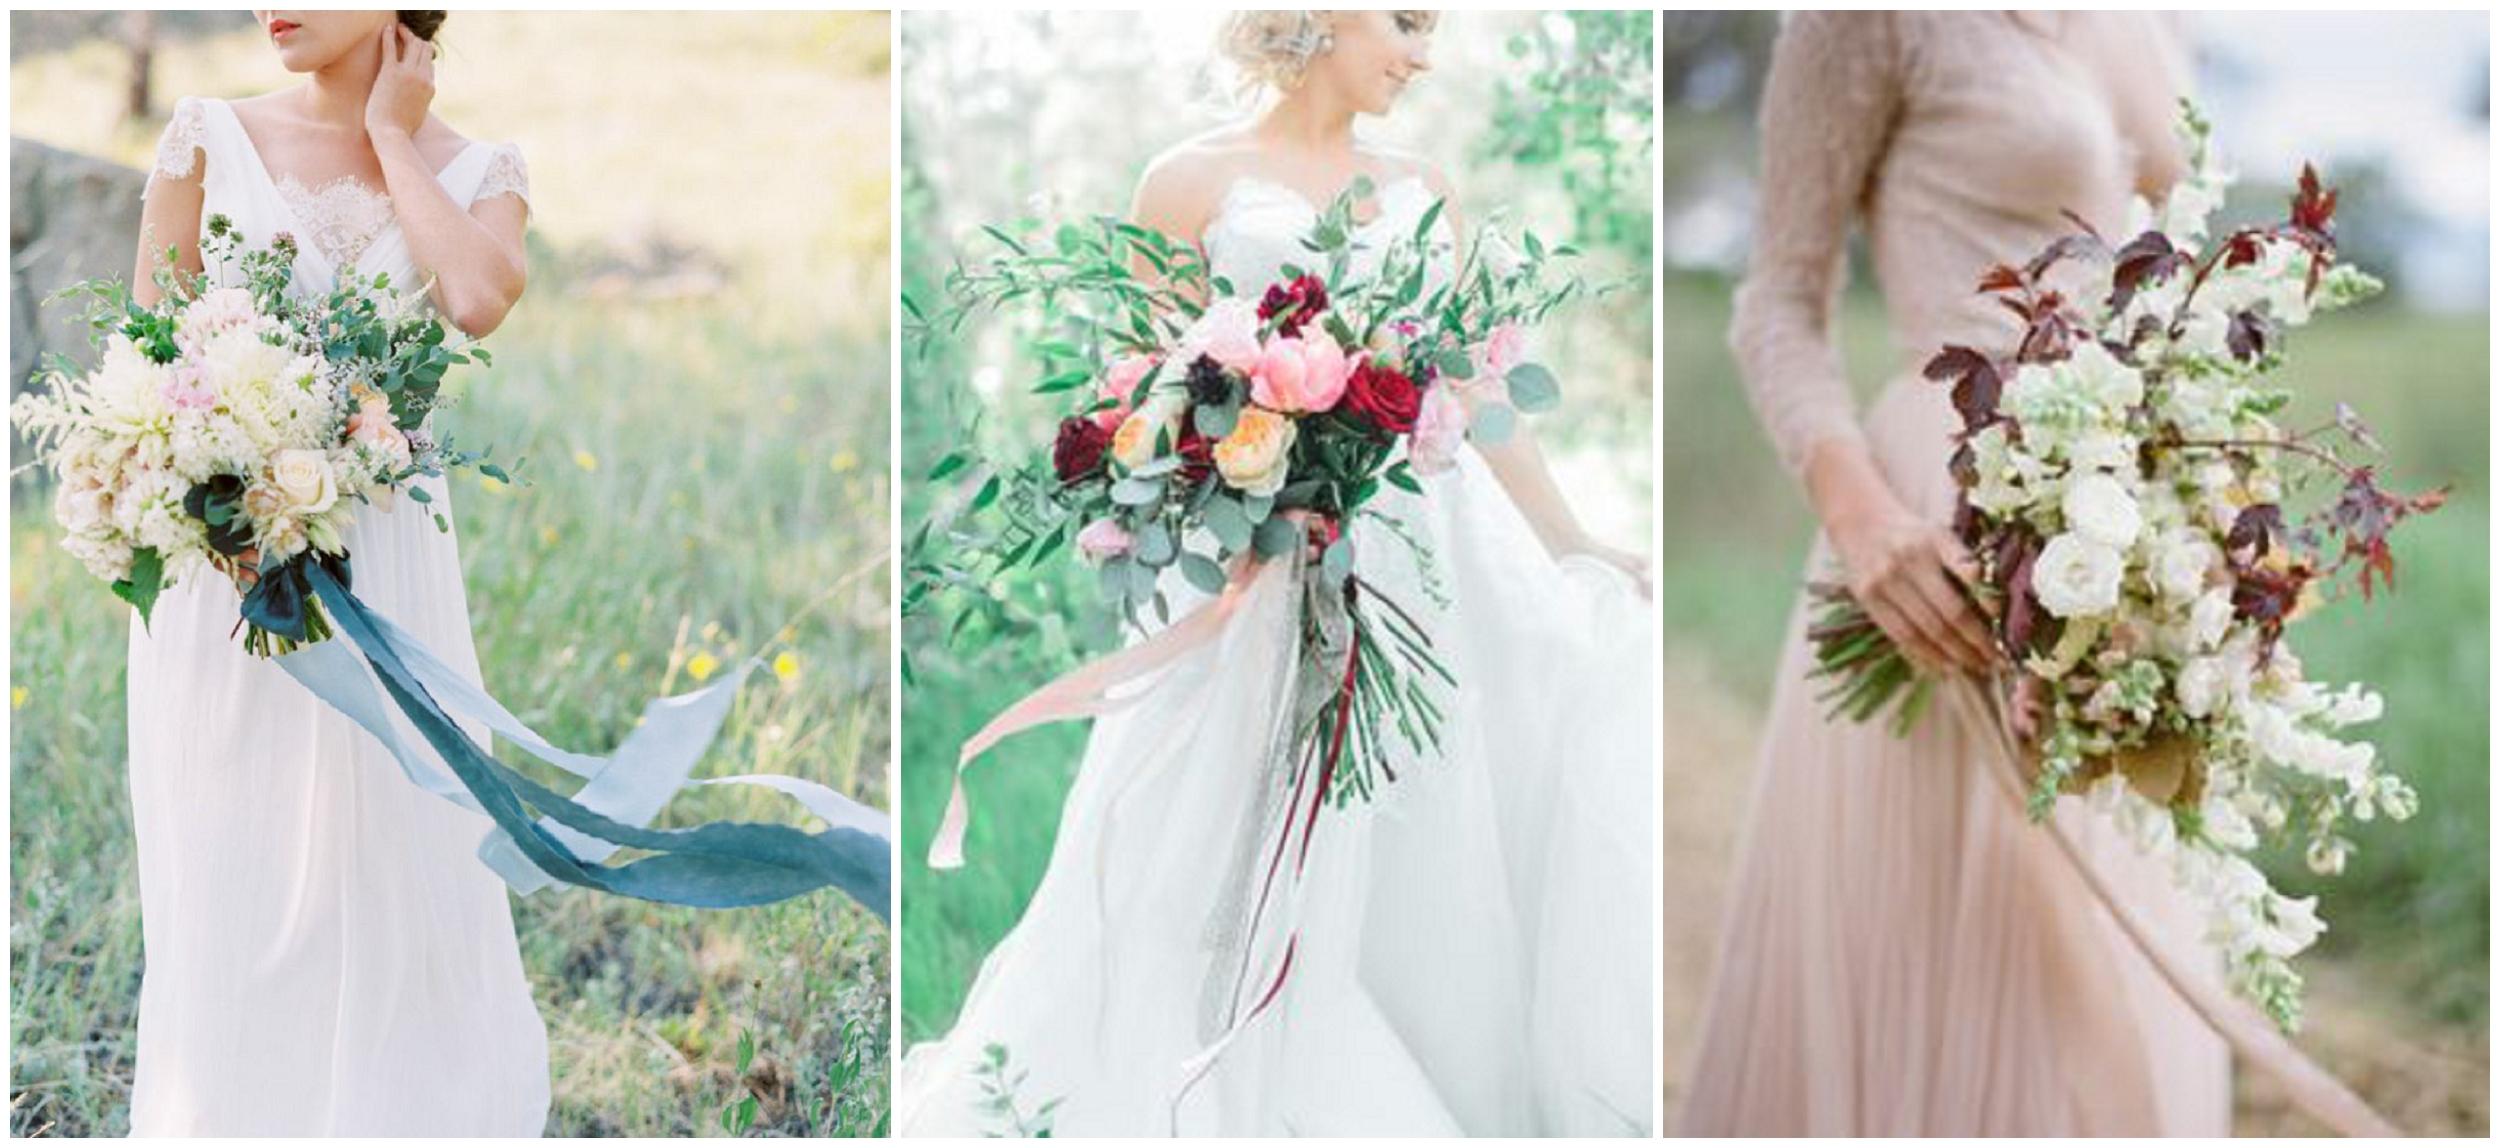 maria+rao+wedding+photographer+portugal_0165.jpg